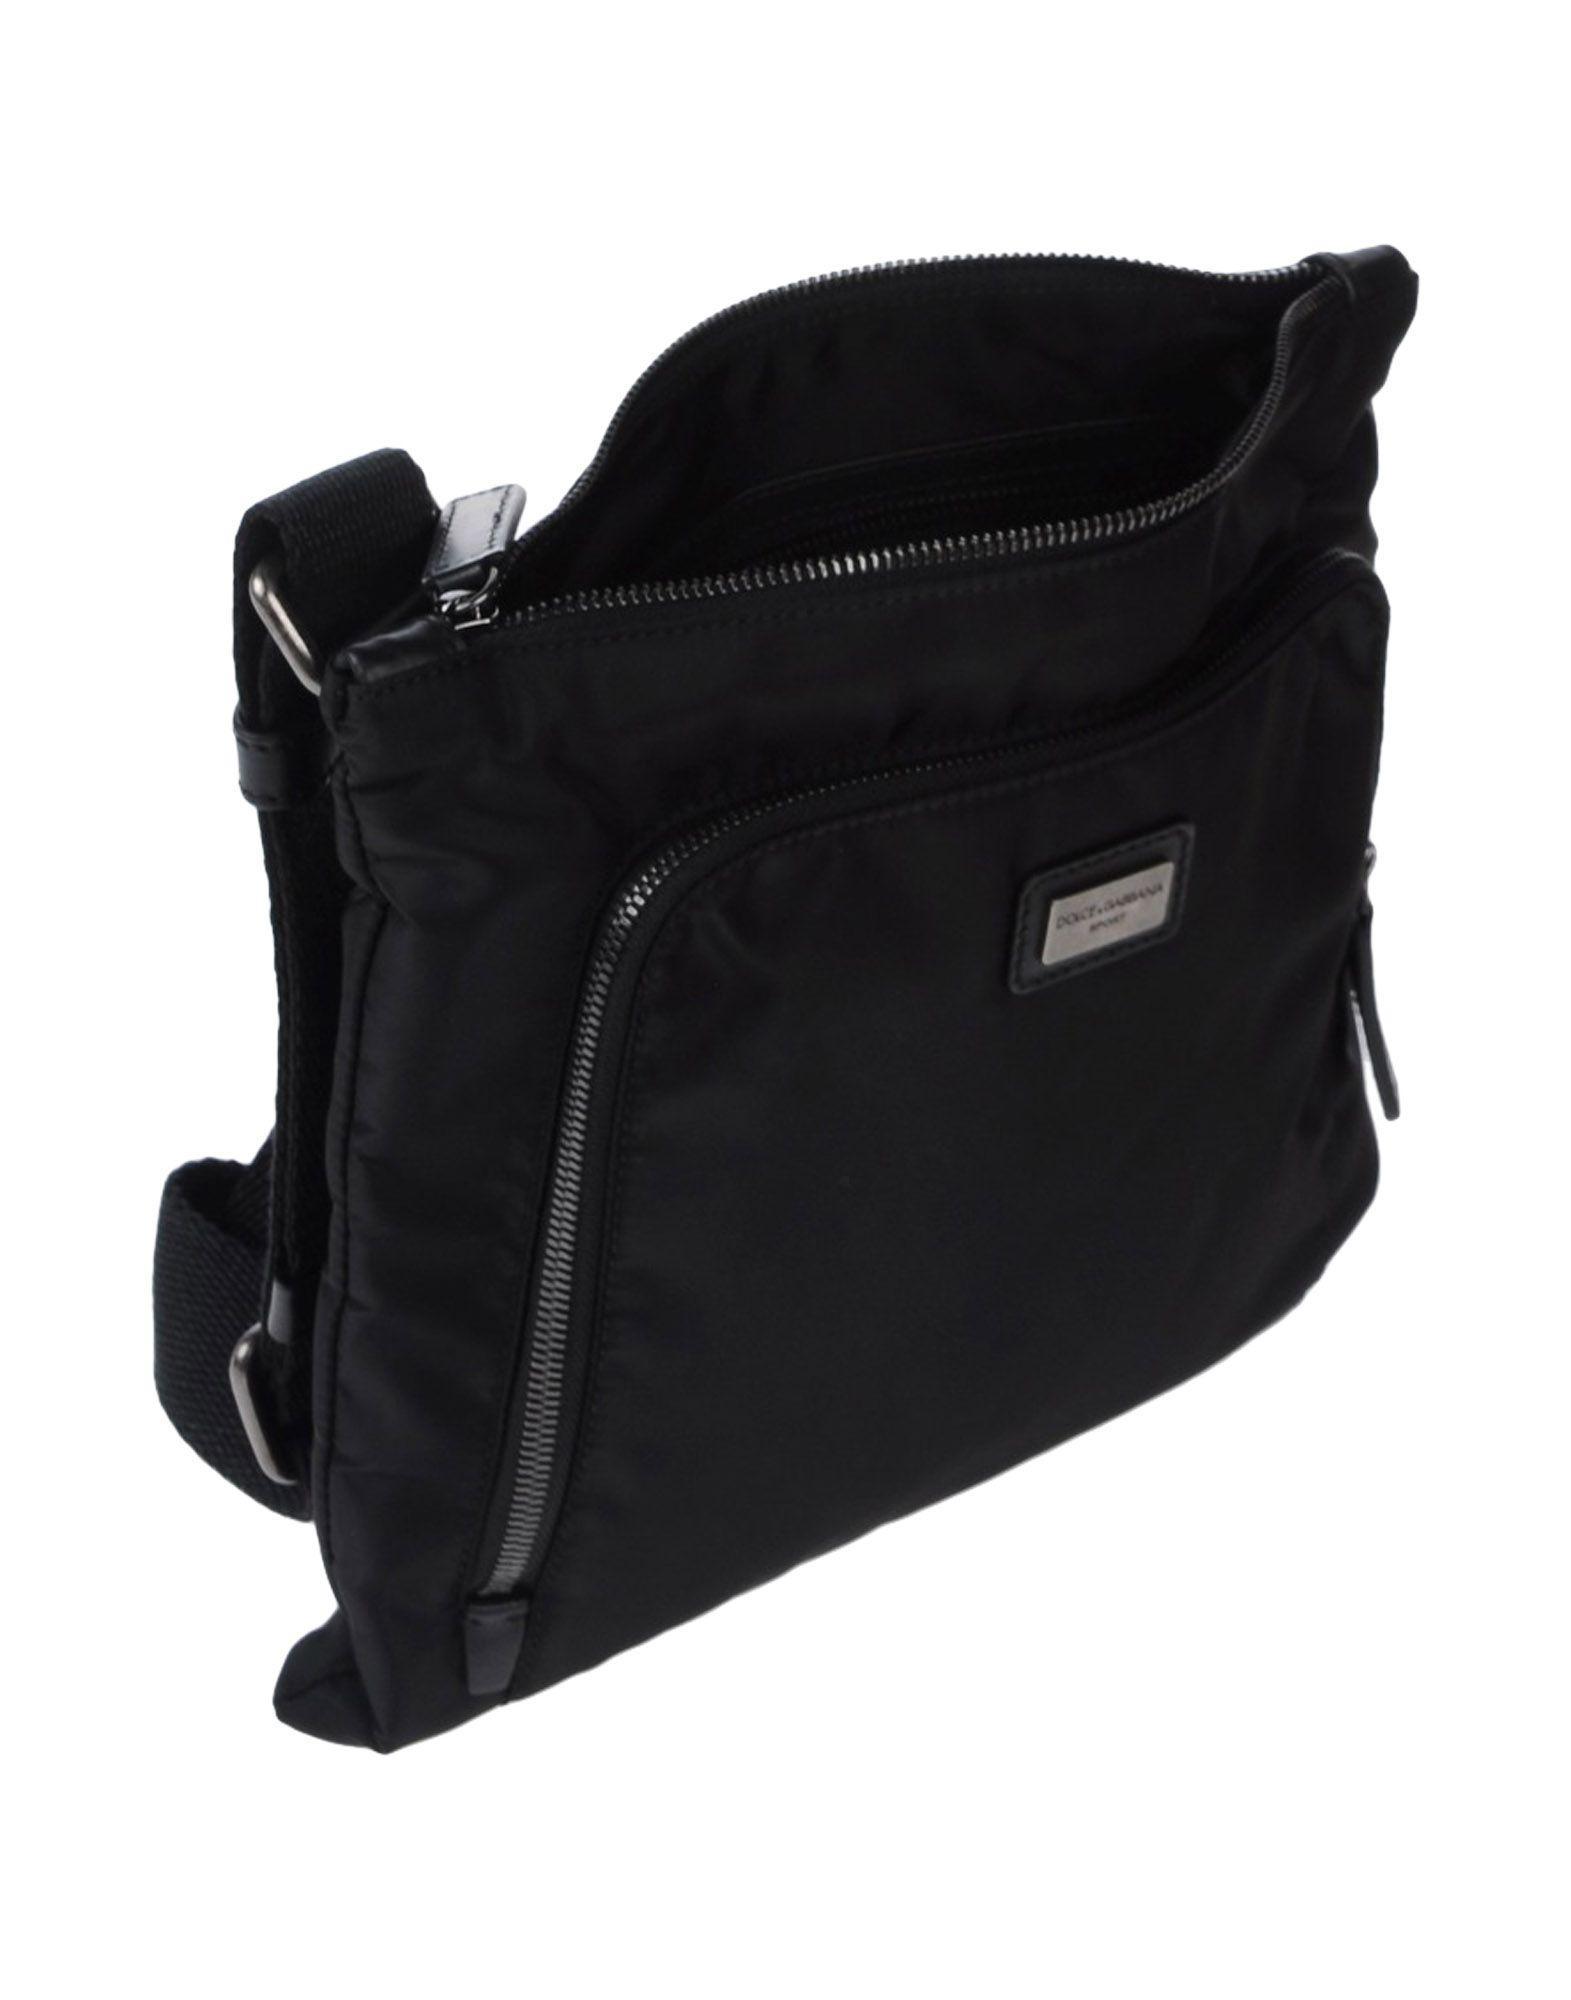 Dolce & Gabbana Cotton Cross-body Bag in Black for Men